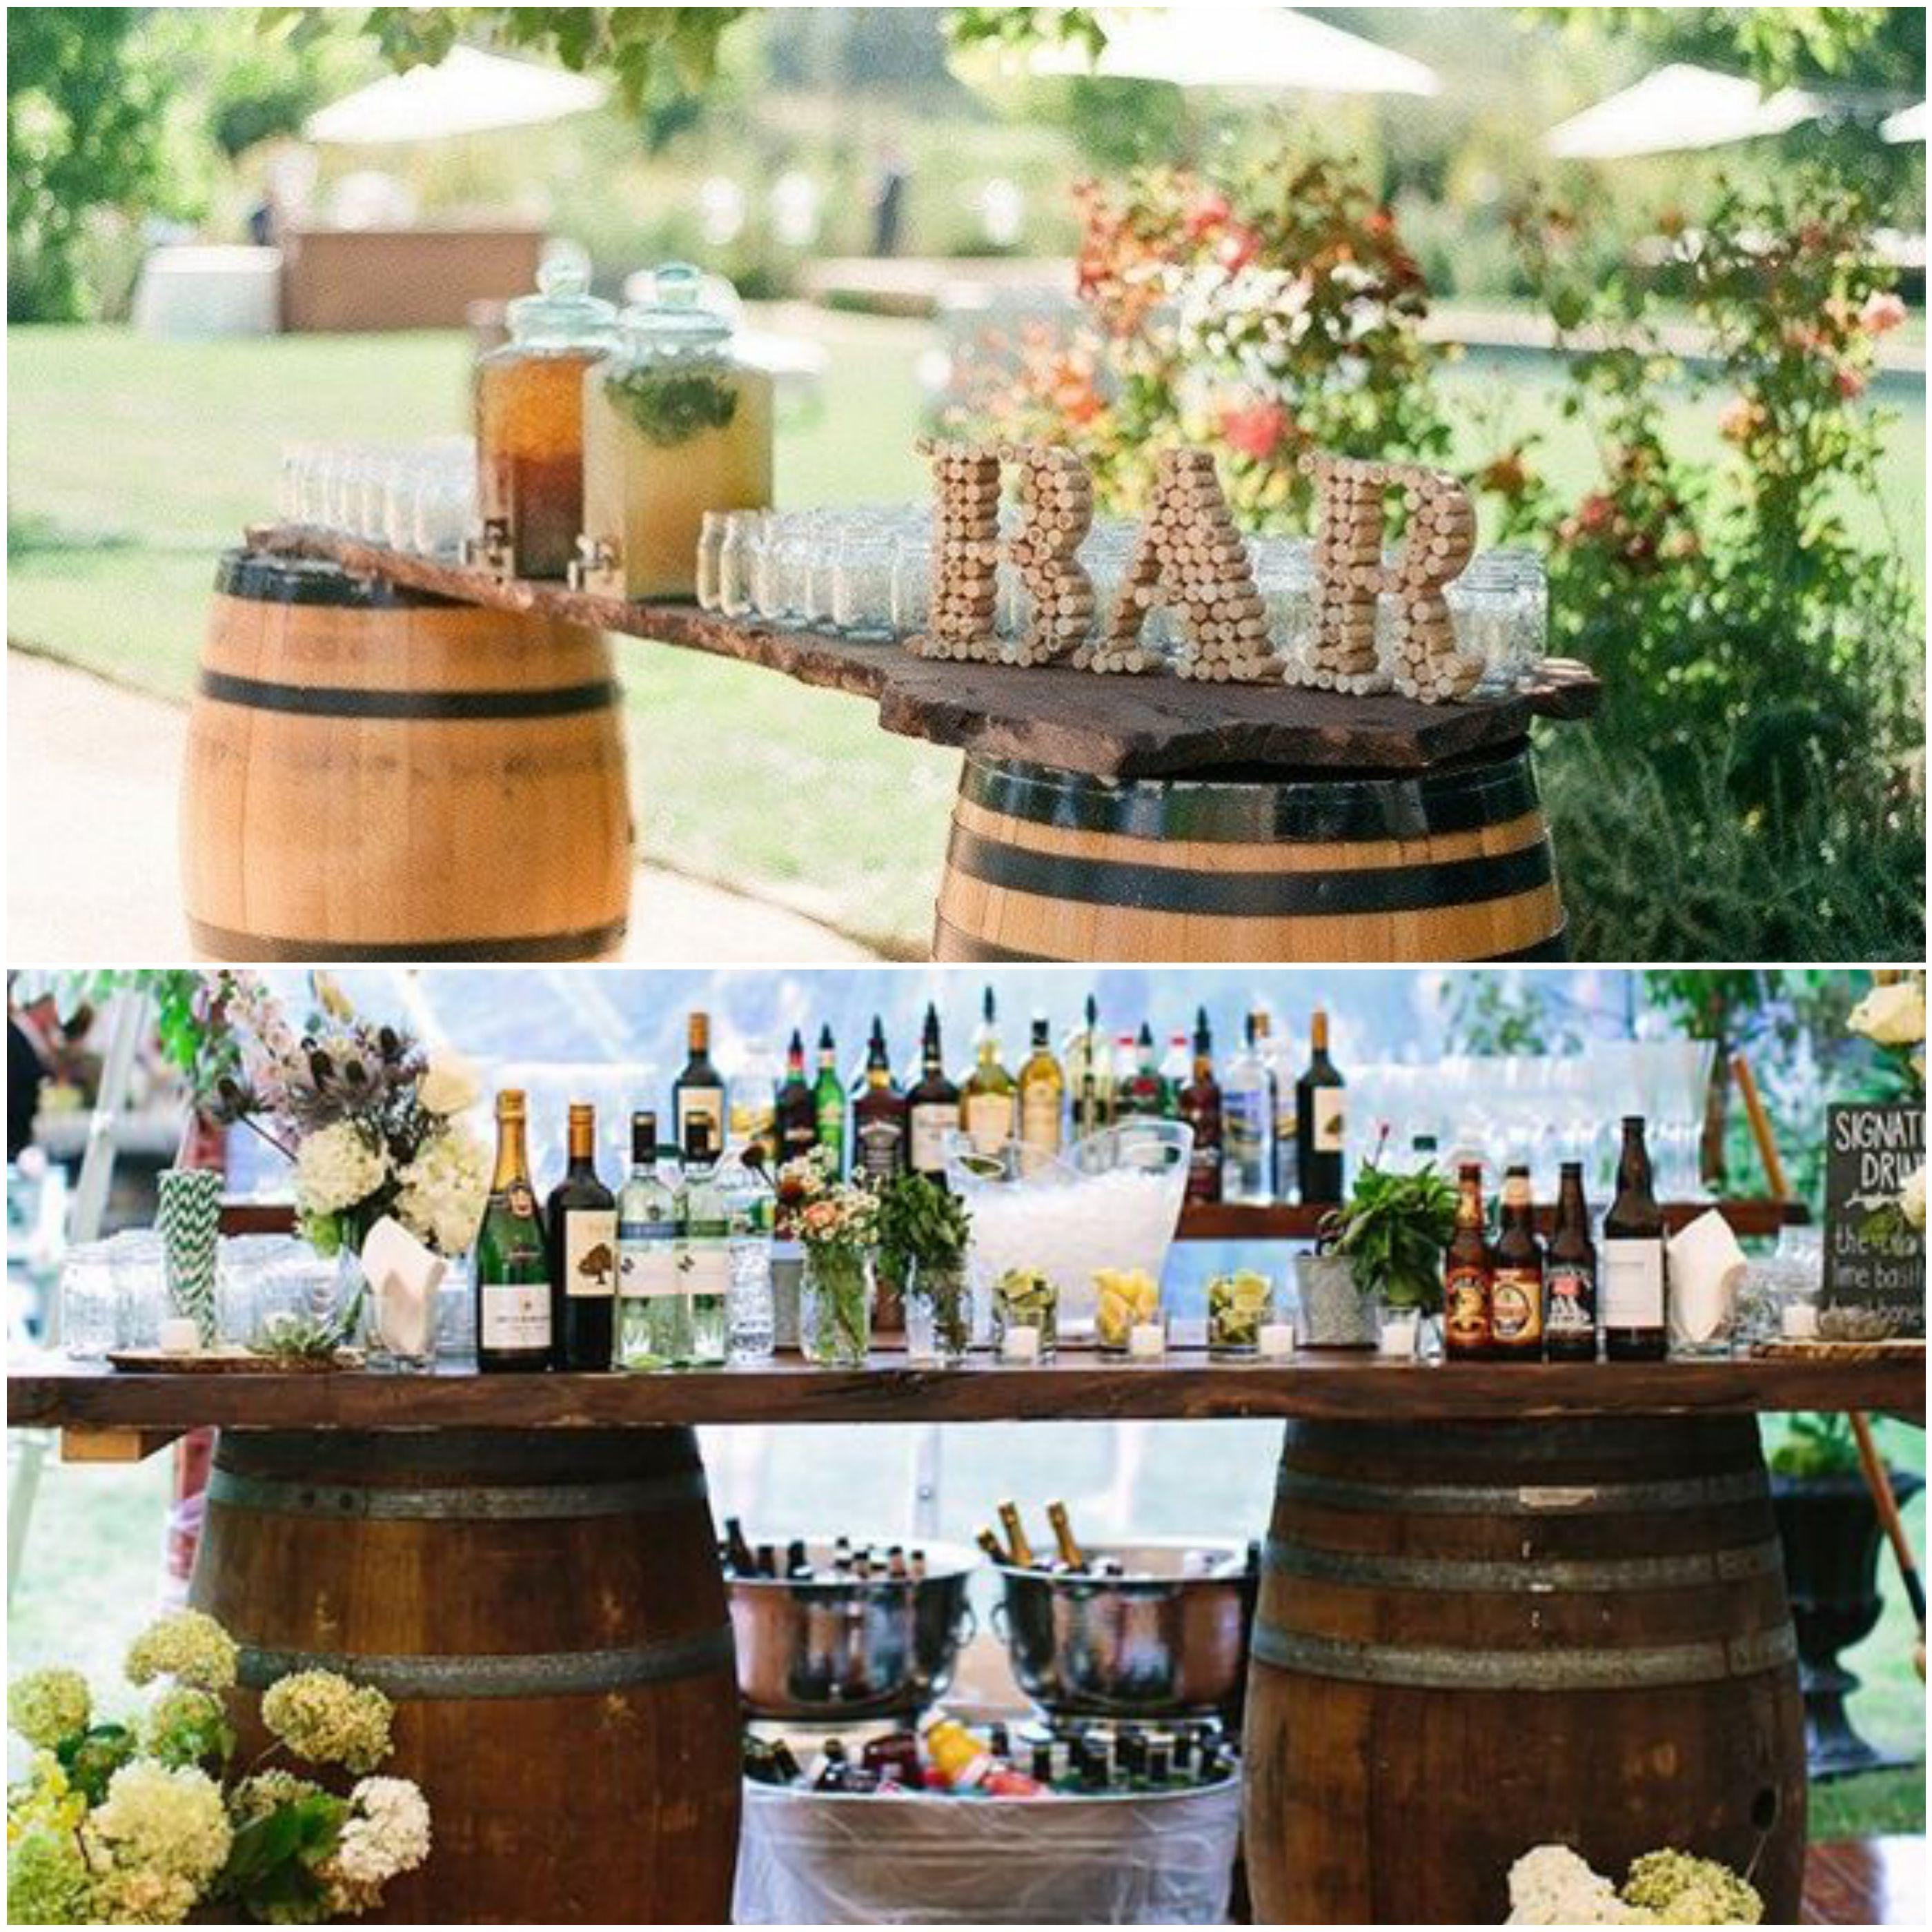 10 Creative Wedding Ideas to Use Wine Barrels Stylish Reception